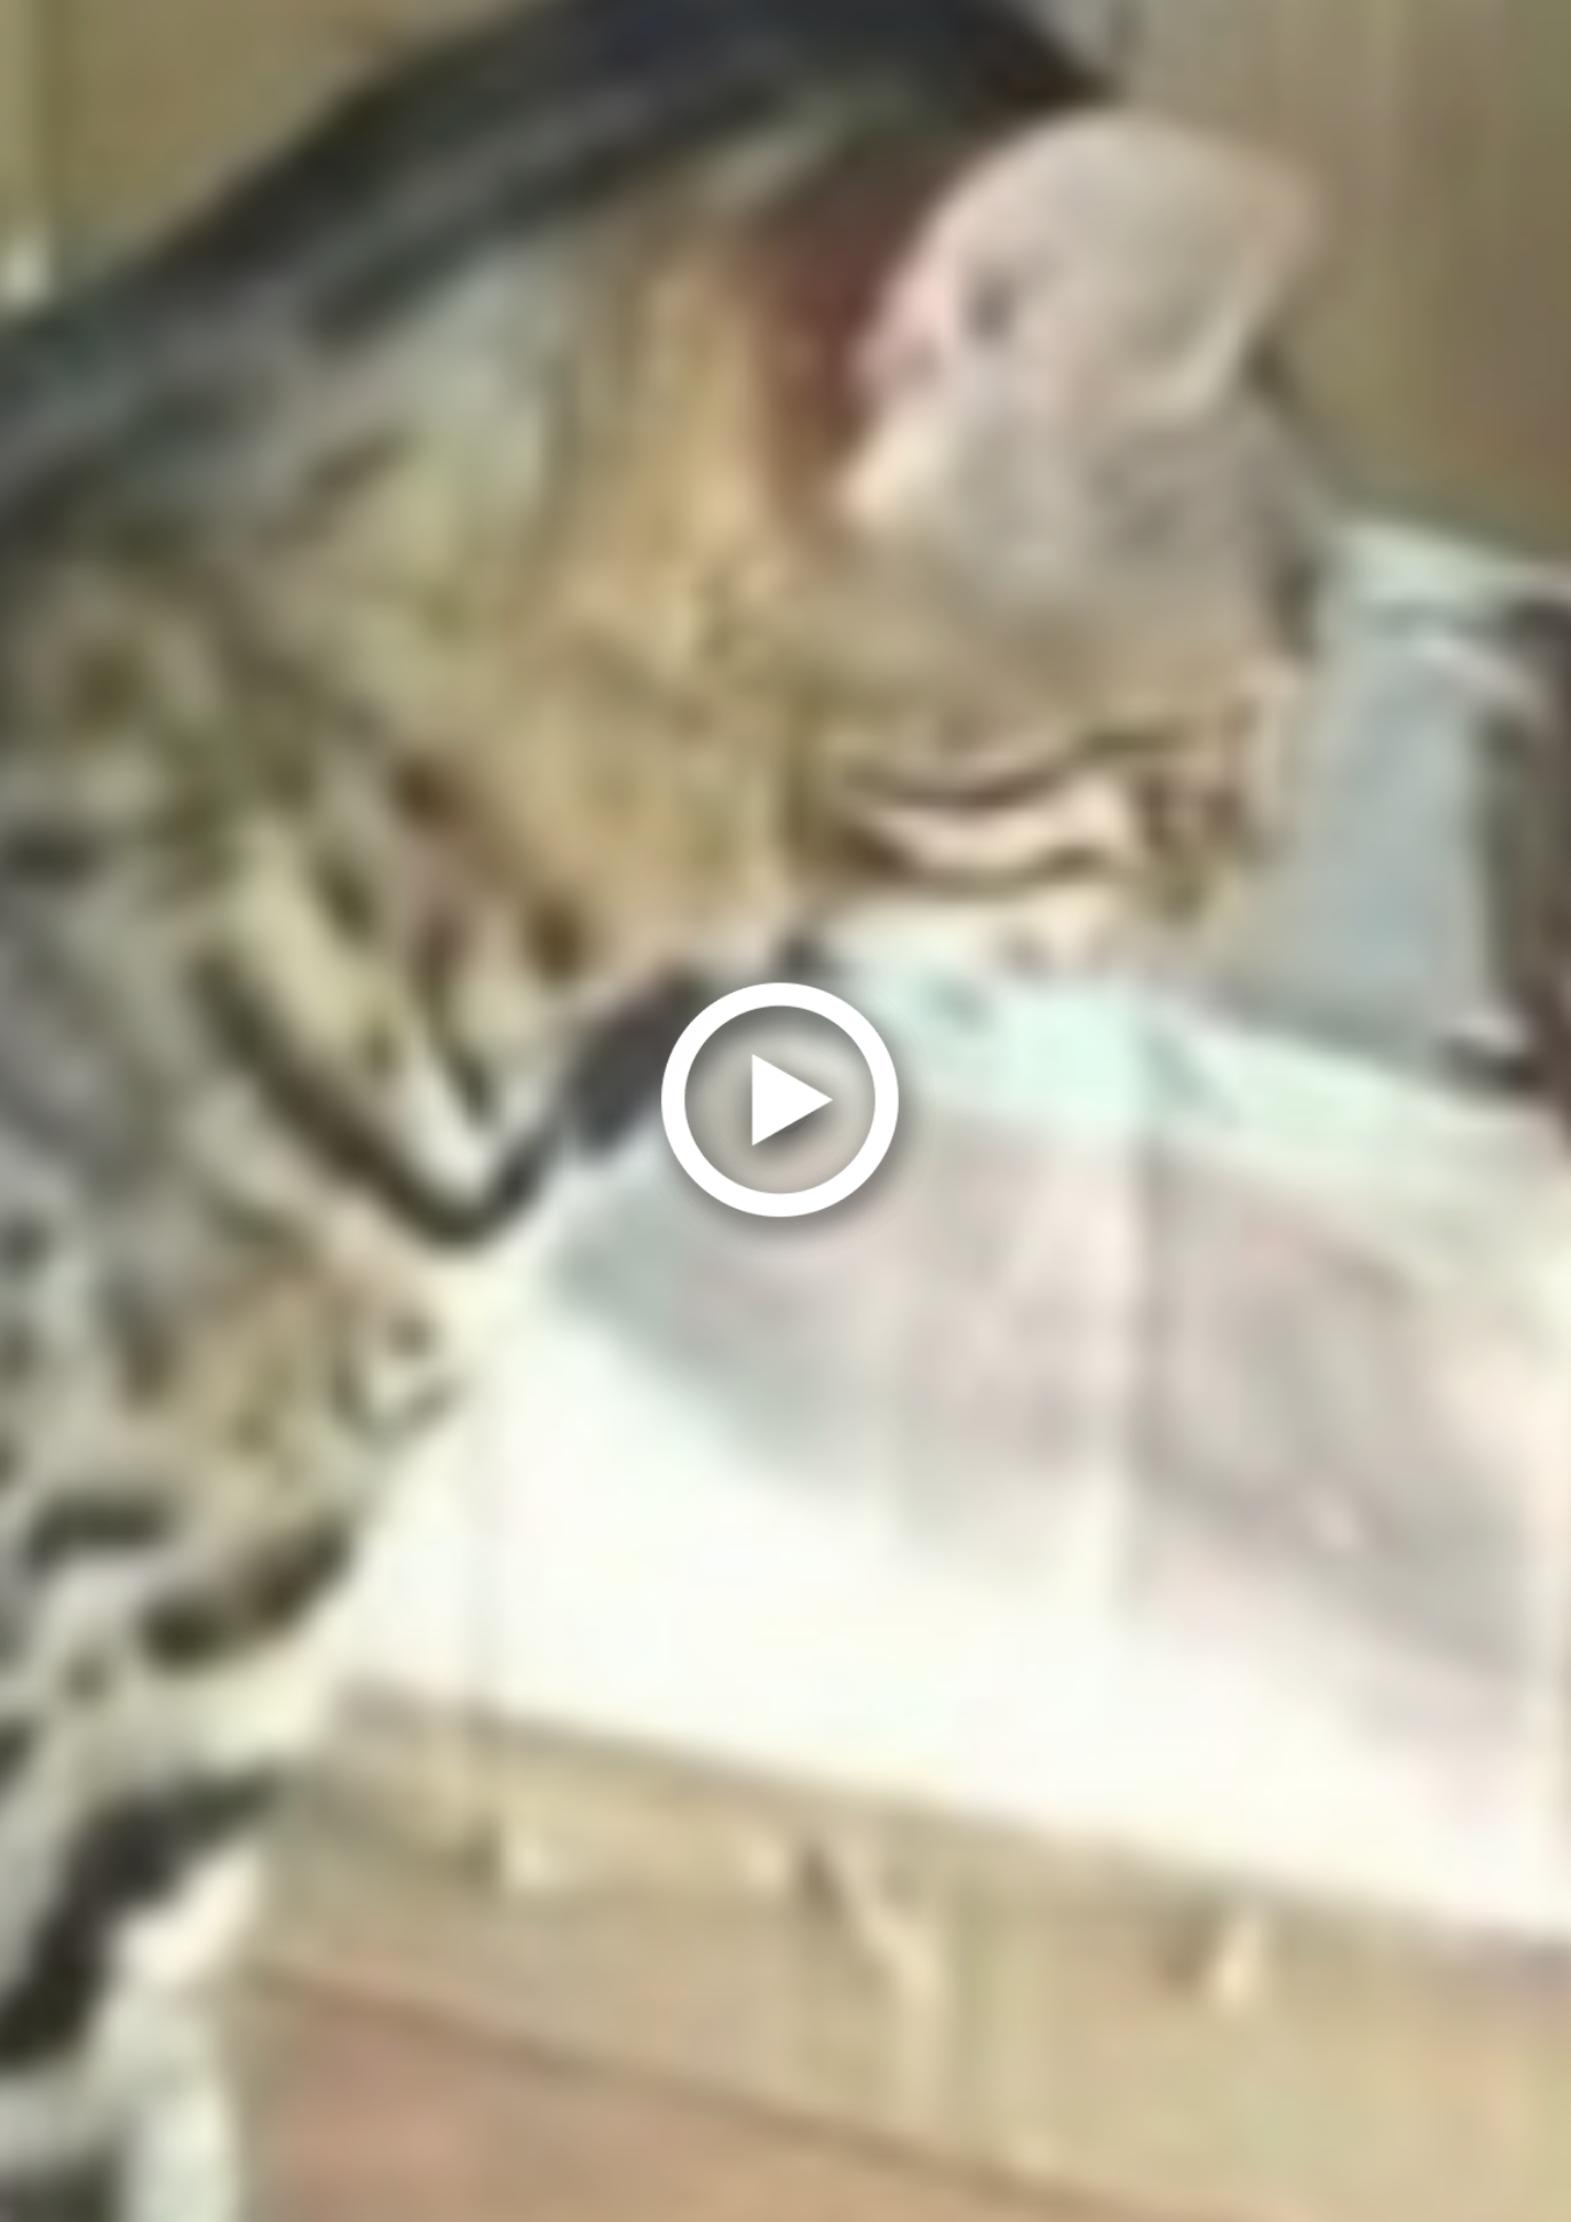 Bengal Cat Kitten Story I Pets Rescue Ideas I Animals Rescue Stories In 2020 Bengal Cat Rescue Bengal Cat Bengal Cat Kitten